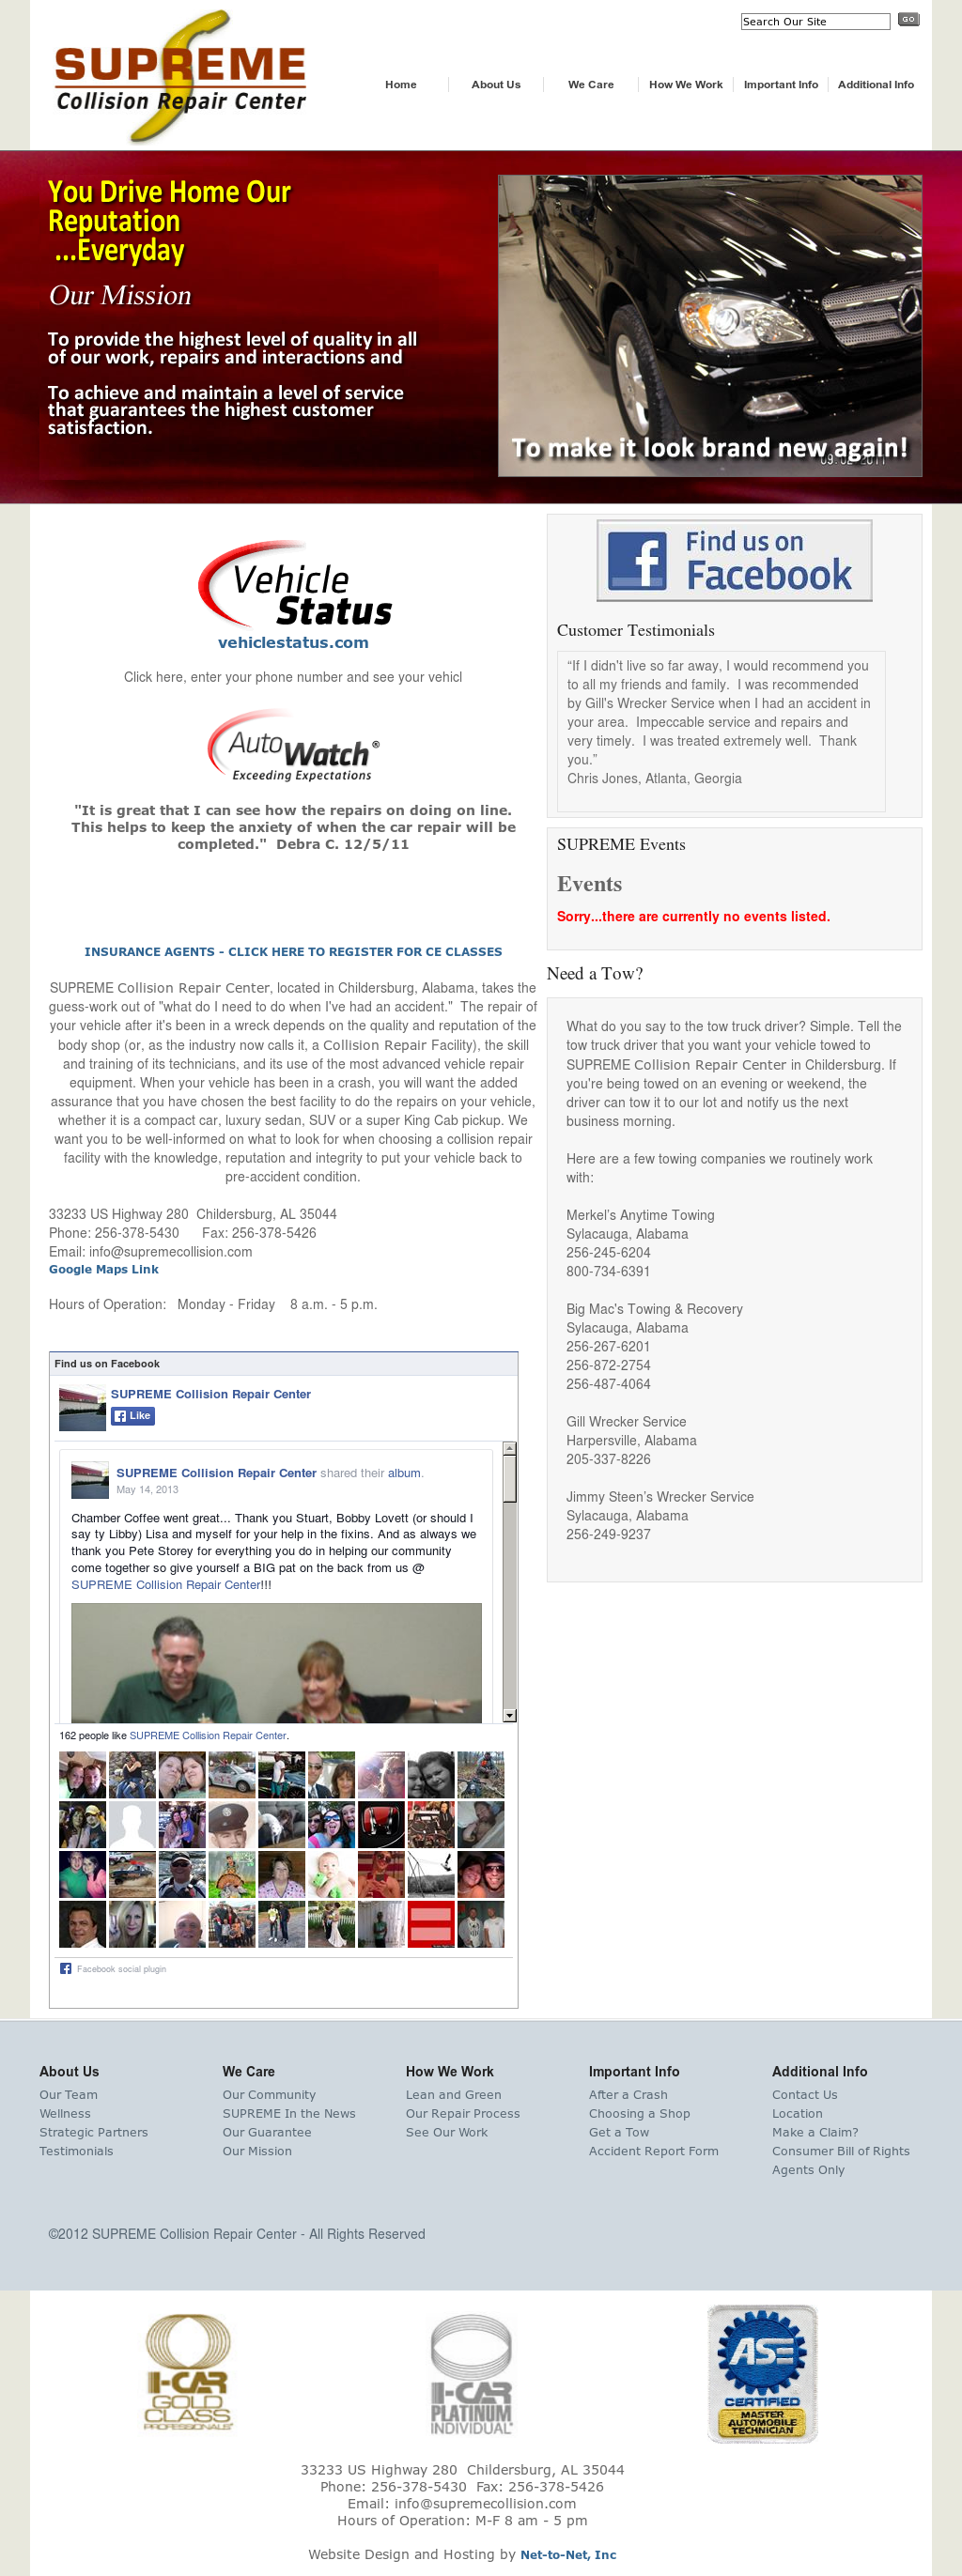 a916acc7efc001 Supreme Collision Repair Center Competitors, Revenue and Employees - Owler  Company Profile